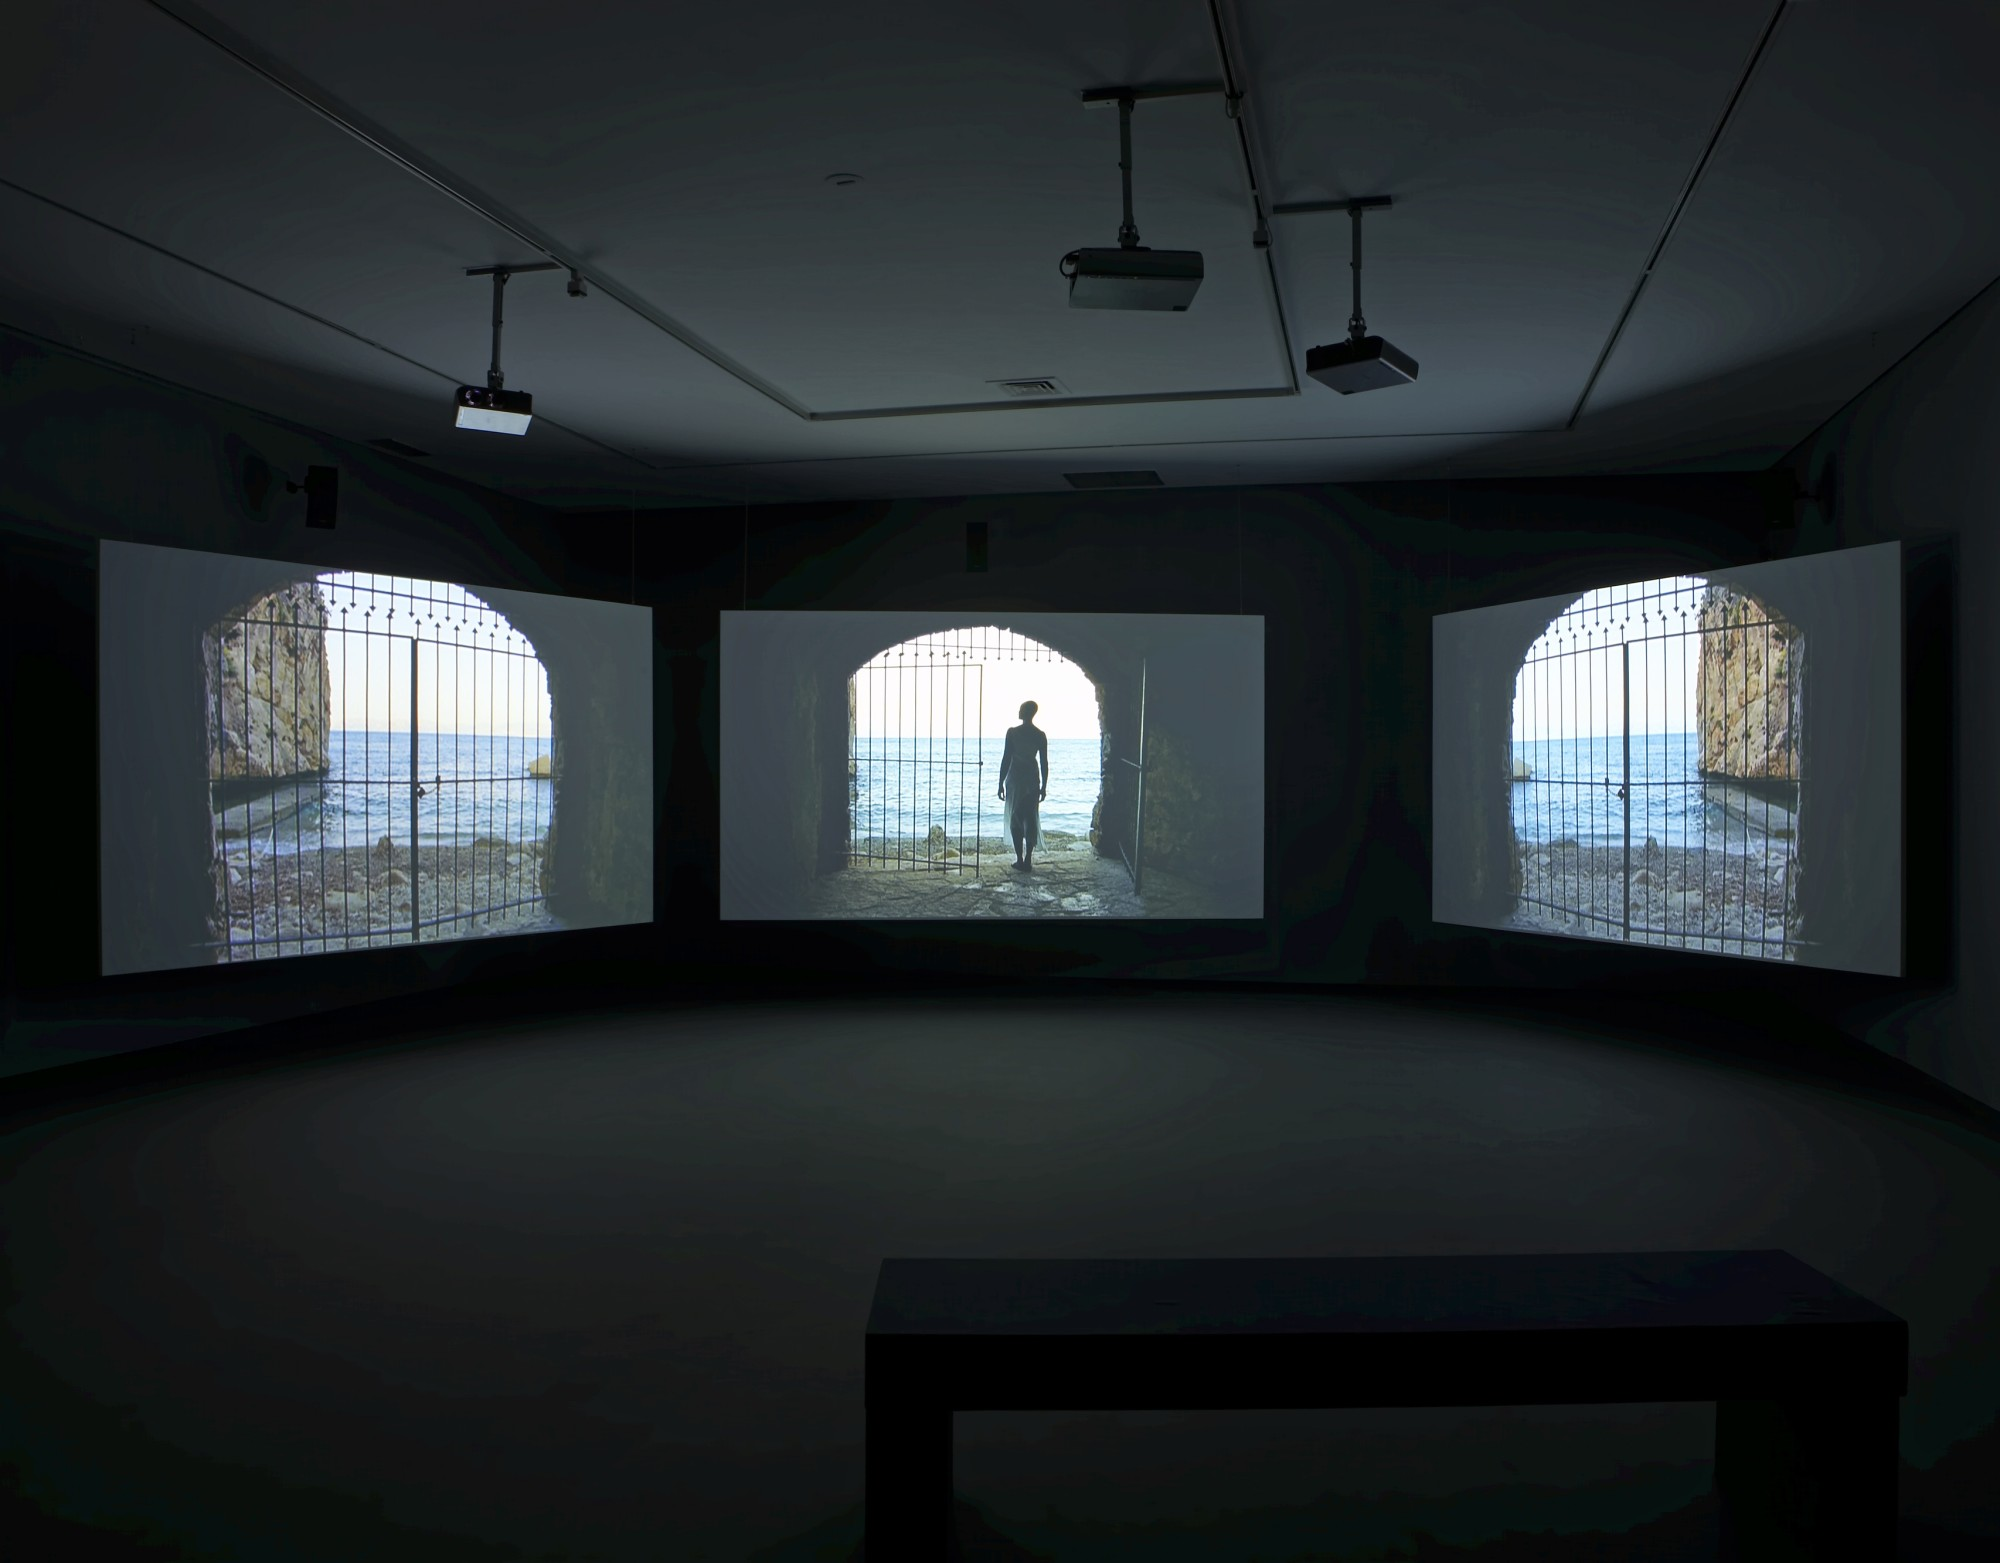 Western Union Small Boats. Galería Helga de Alvear, Madrid, 2008  18'22', three-screen film installation, 16mm film transferred to digital, colour, 5.1 sound